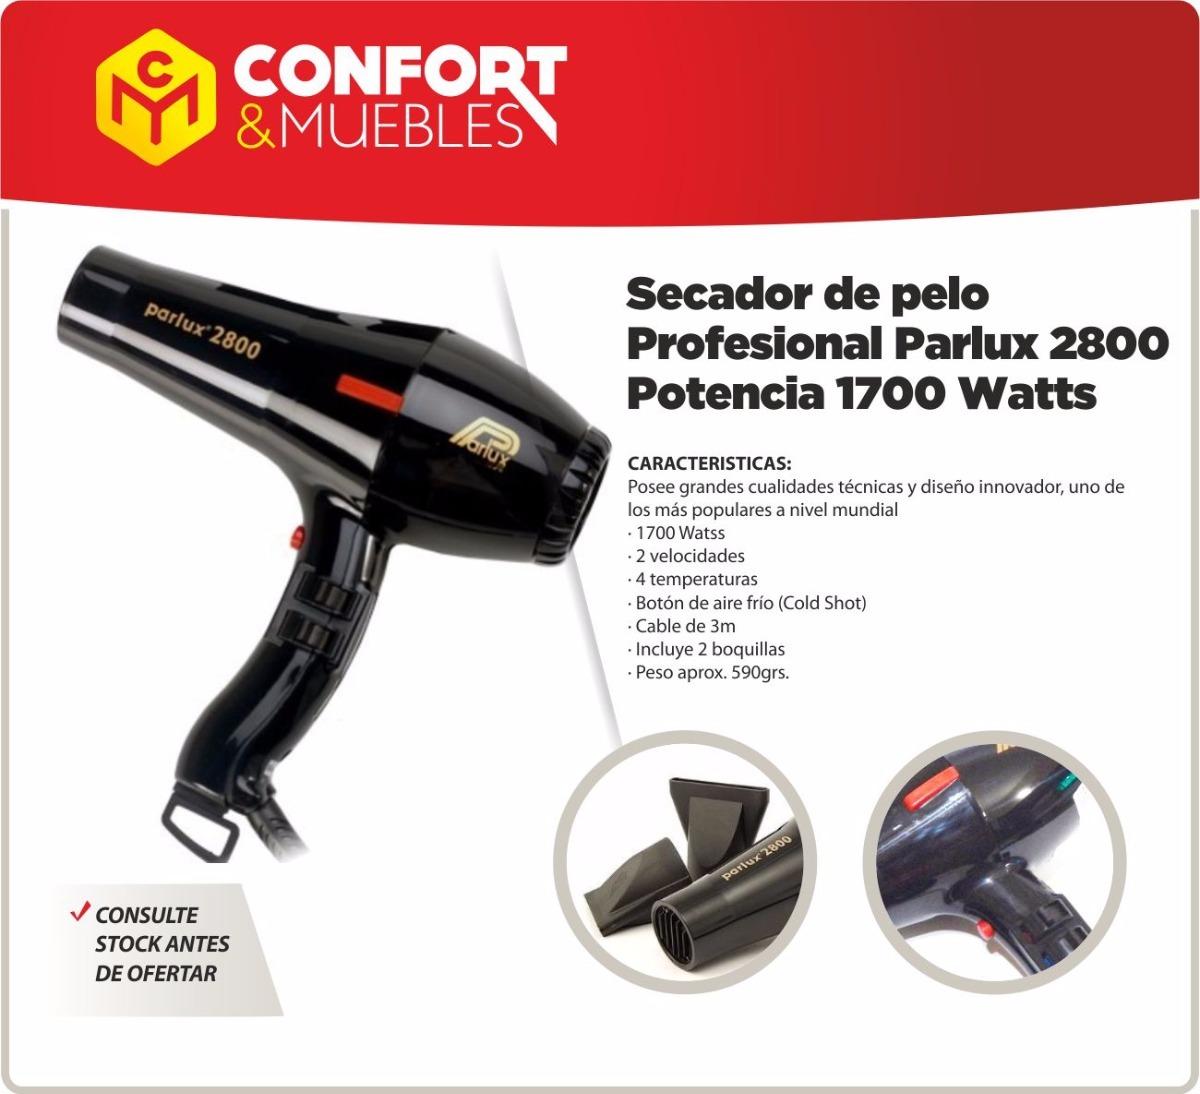 secador de pelo profesional parlux 2800 potencia 1700 watts. Cargando zoom. 7833ff2d41b9